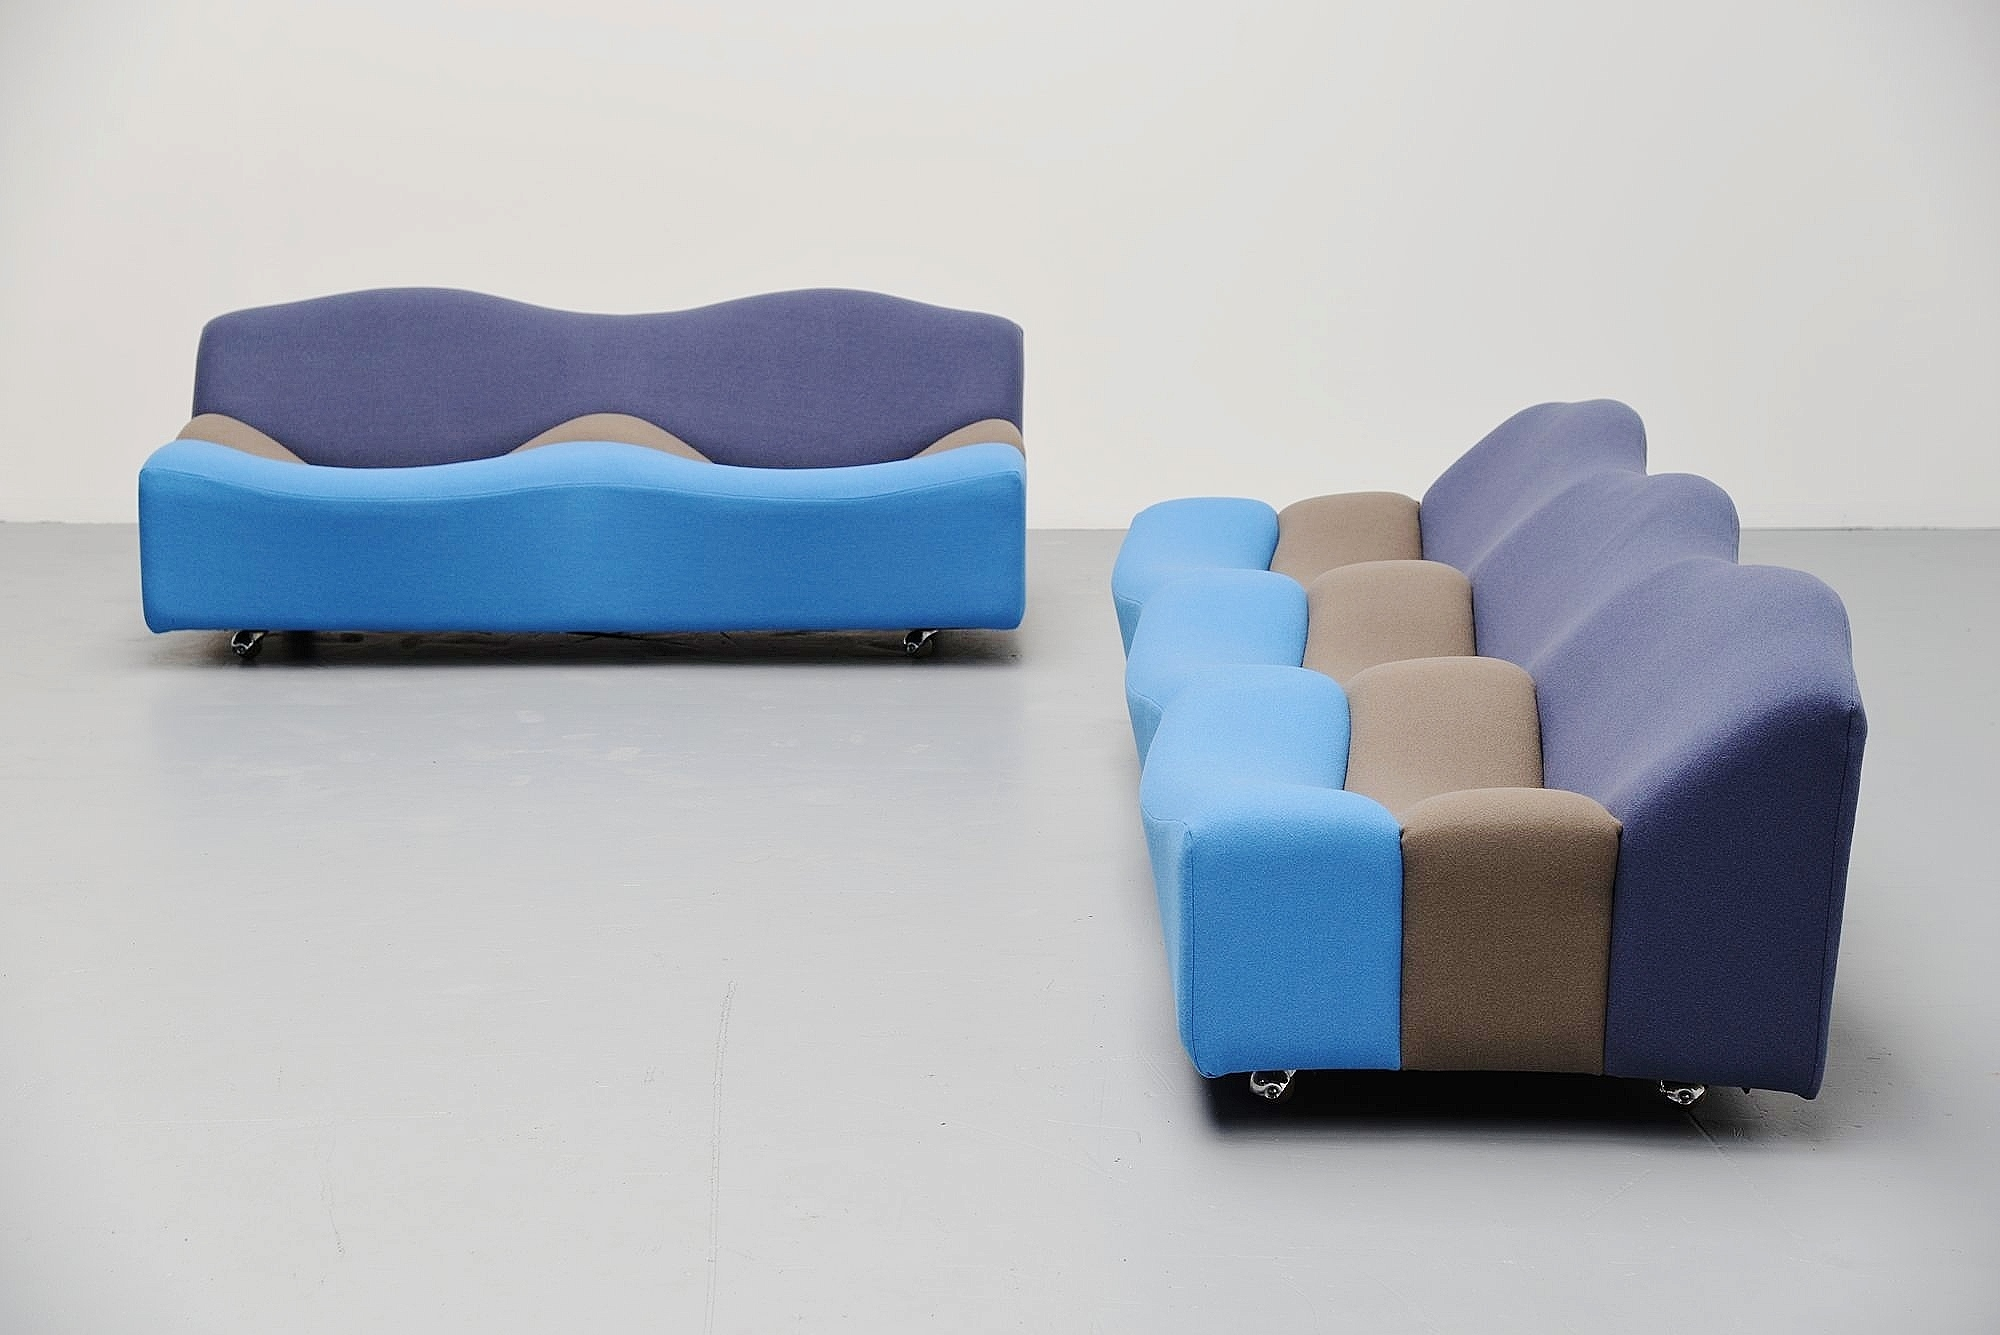 Pierre paulin abcd sofa set artifort 1968 u2013 massmoderndesign